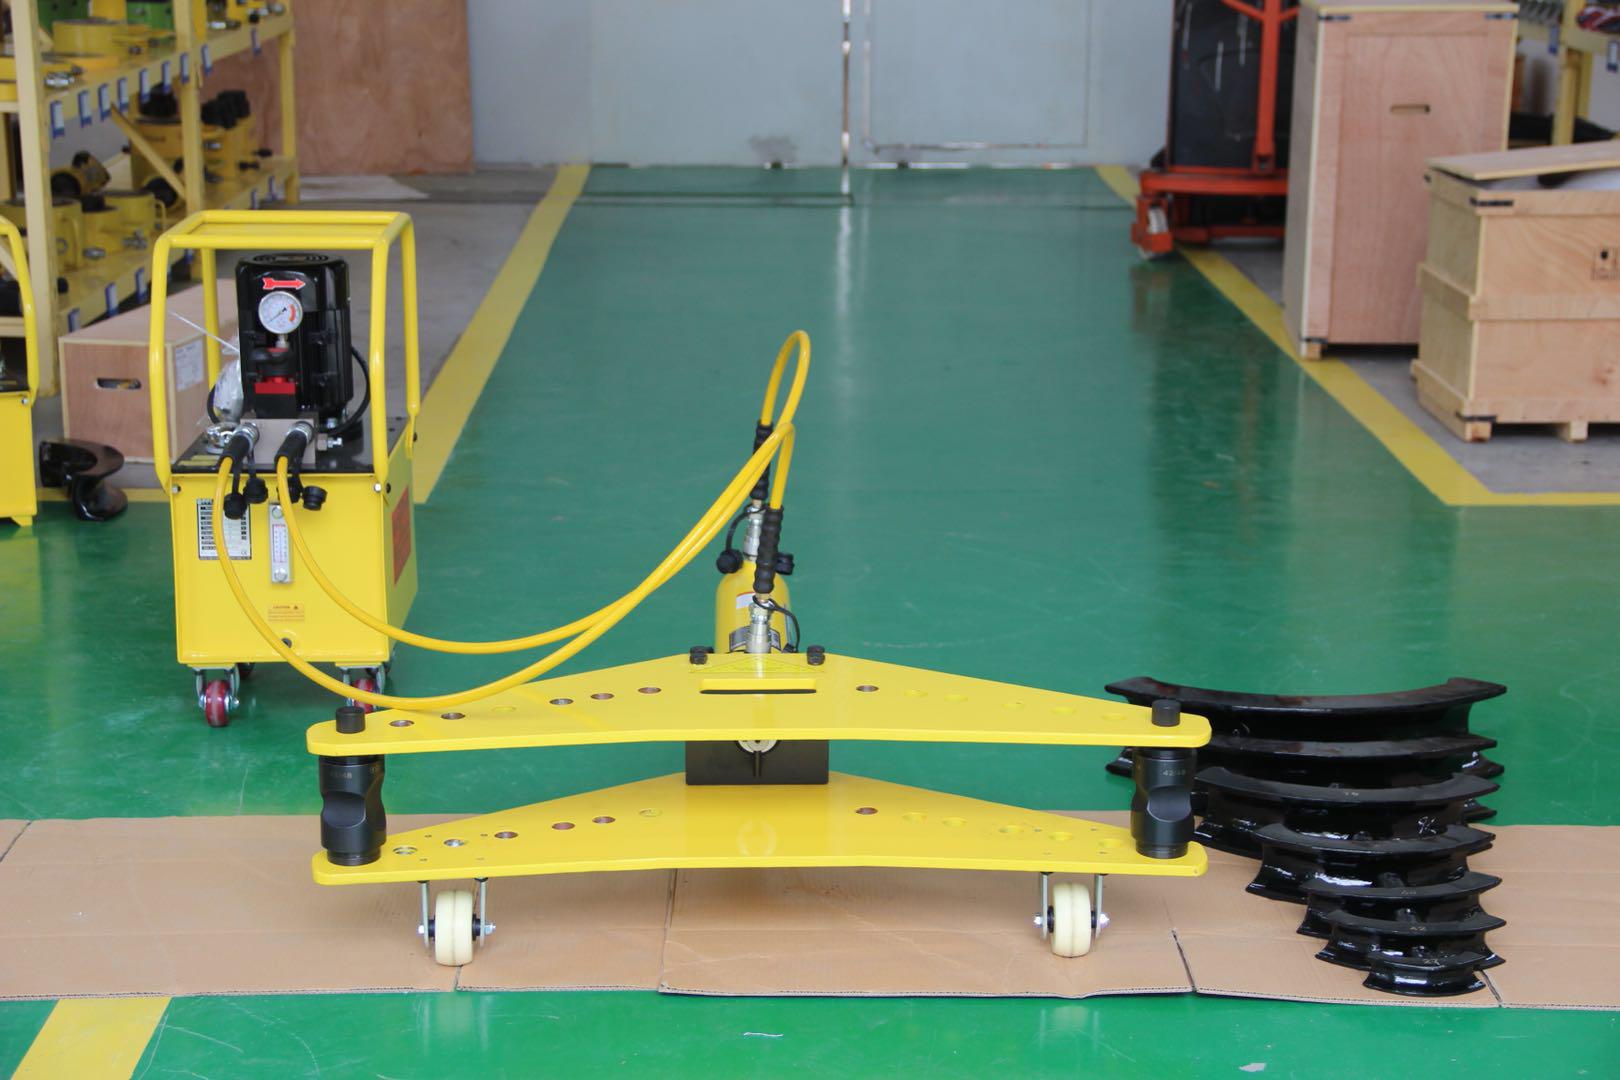 मोटर चालित उच्च दाब बिजली हाइड्रोलिक तेल पंप